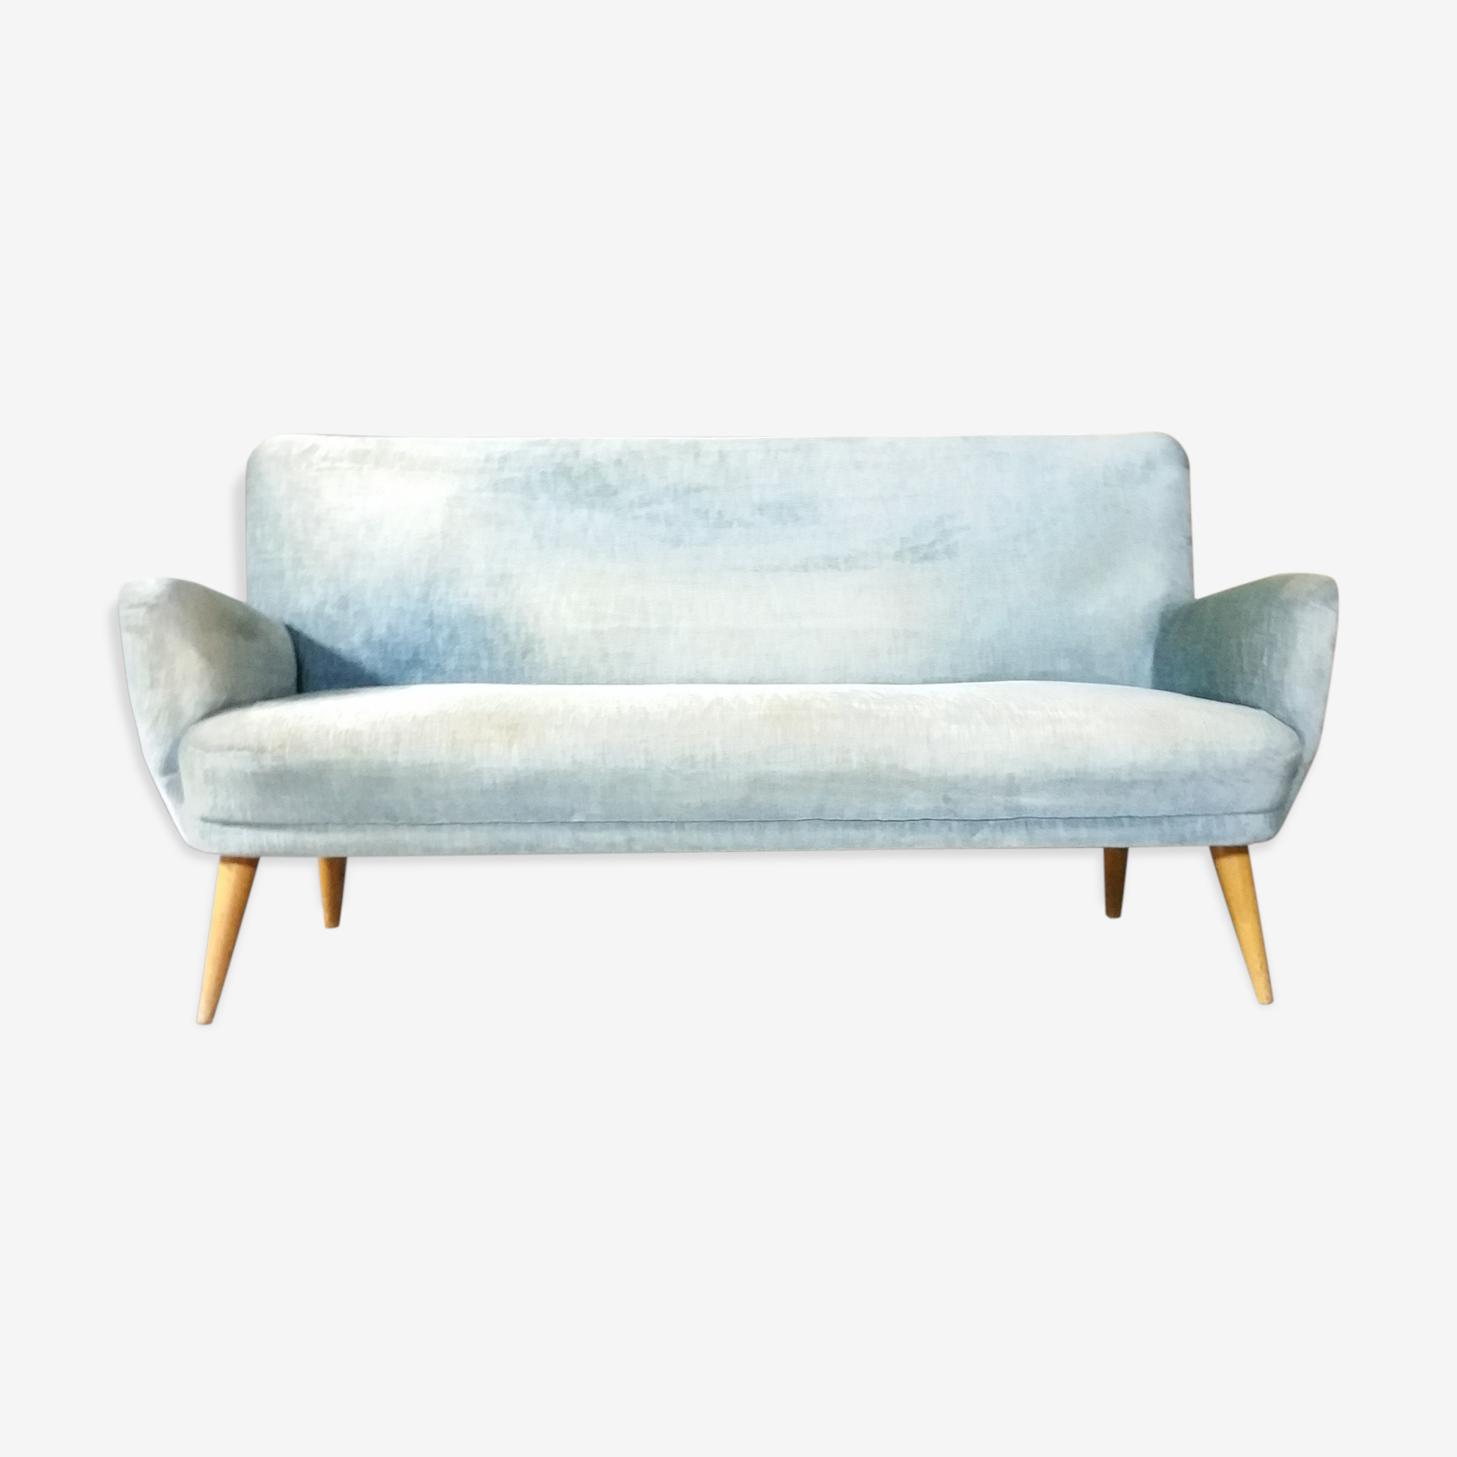 Canapé sofa année 50-60